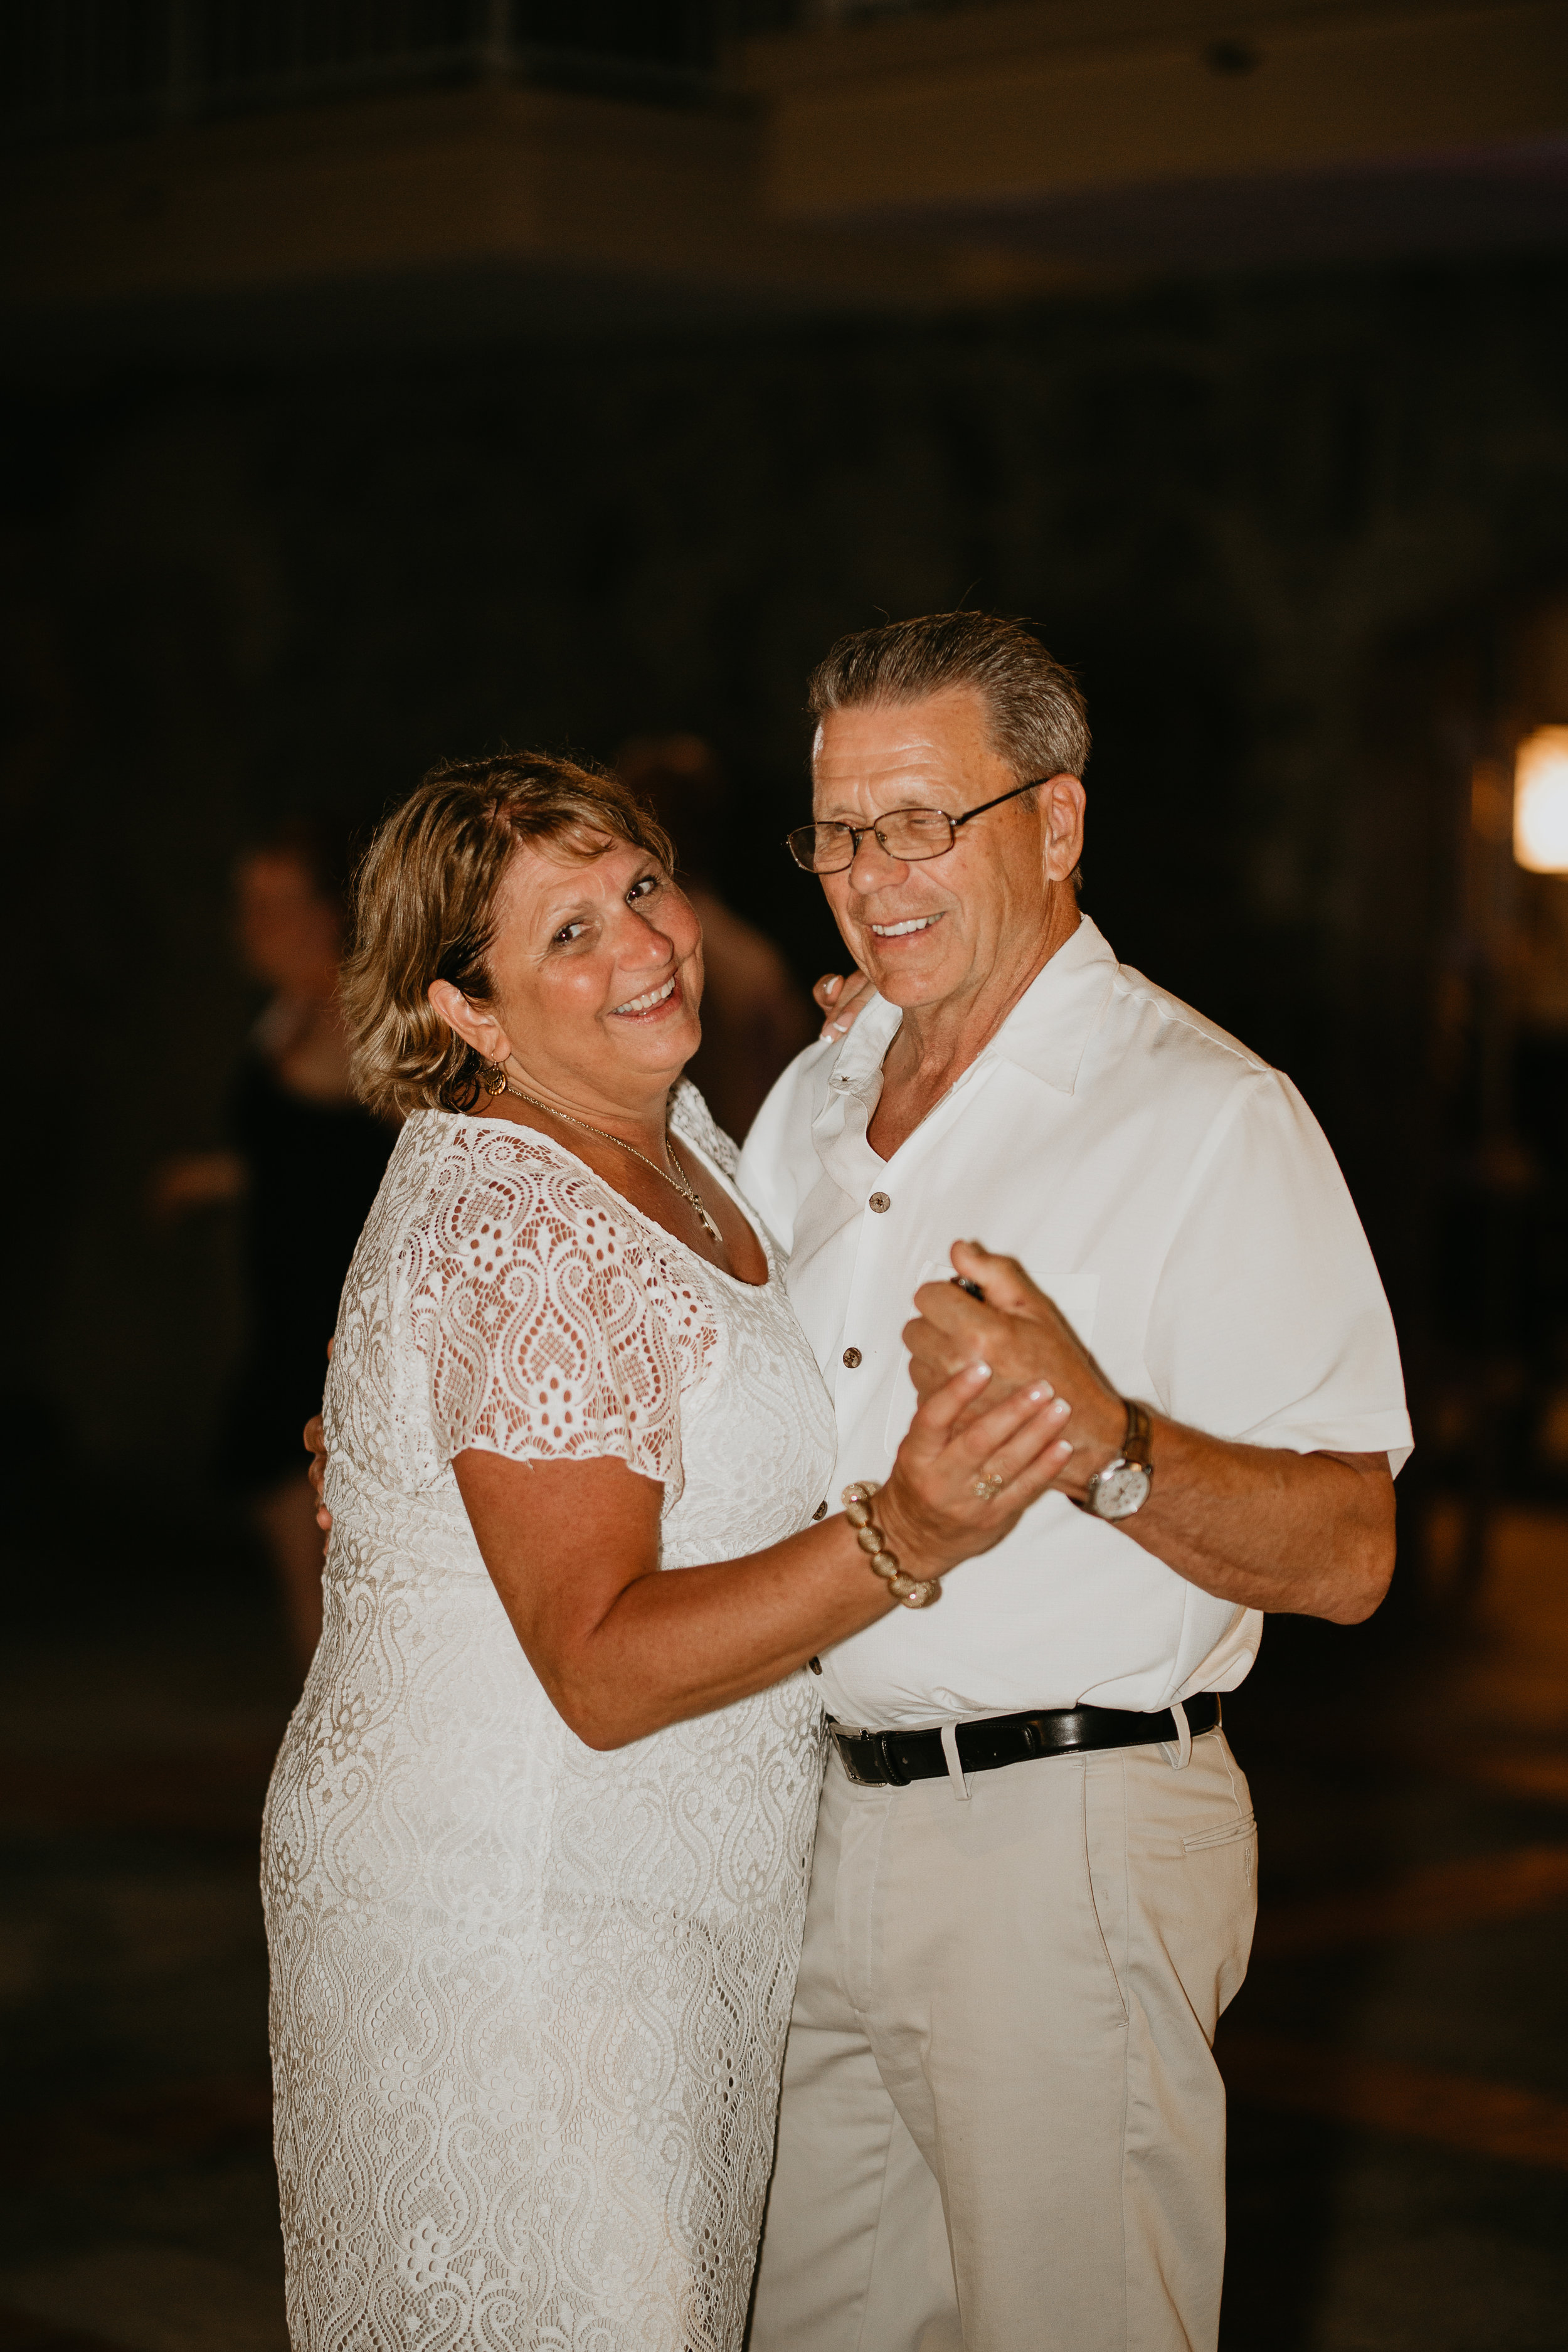 nicole-daacke-photography-destination-wedding-in-st-lucia-sandals-la-toc-intimate-island-wedding-carribean-elopement-photographer-chill-island-wedding-167.jpg